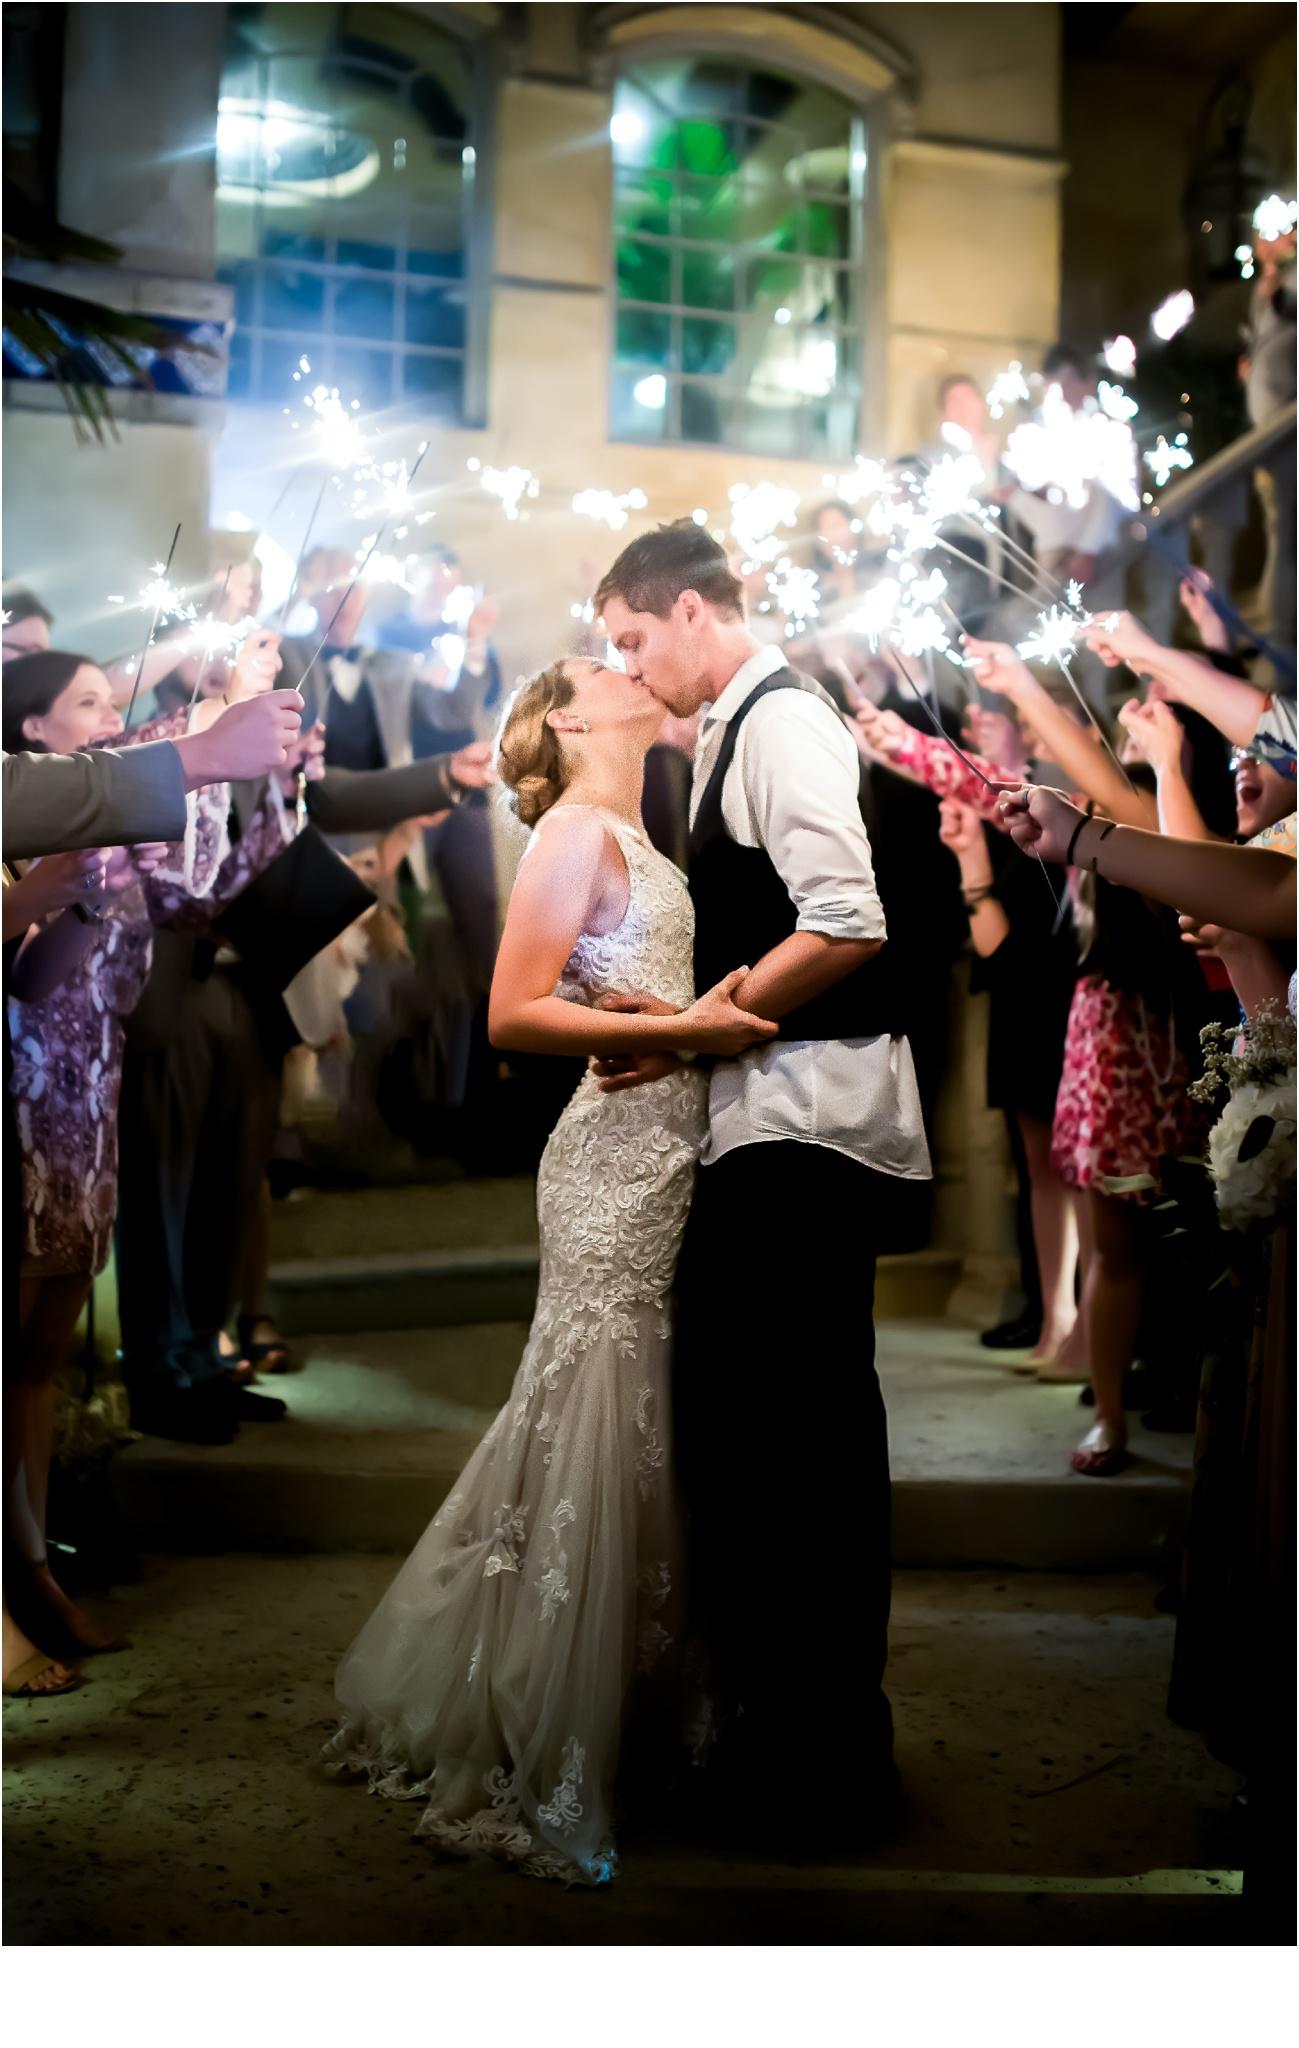 Rainey_Gregg_Photography_St._Simons_Island_Georgia_California_Wedding_Portrait_Photography_0684.jpg